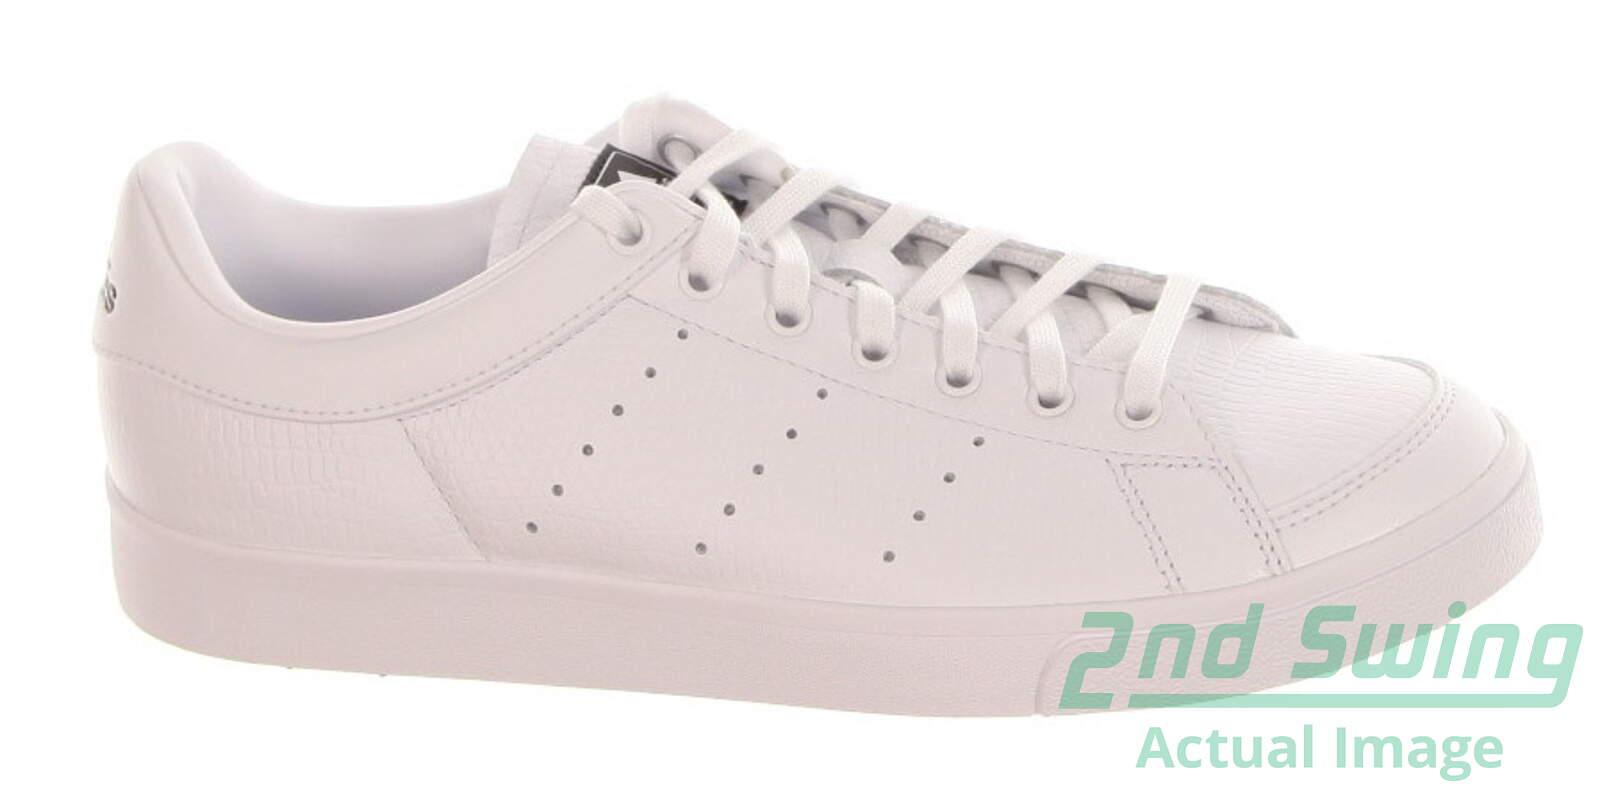 30a2b0771e52 New Mens Golf Shoe Adidas Adicross Classic Medium 8 White MSRP  100 - Golf  Footwear